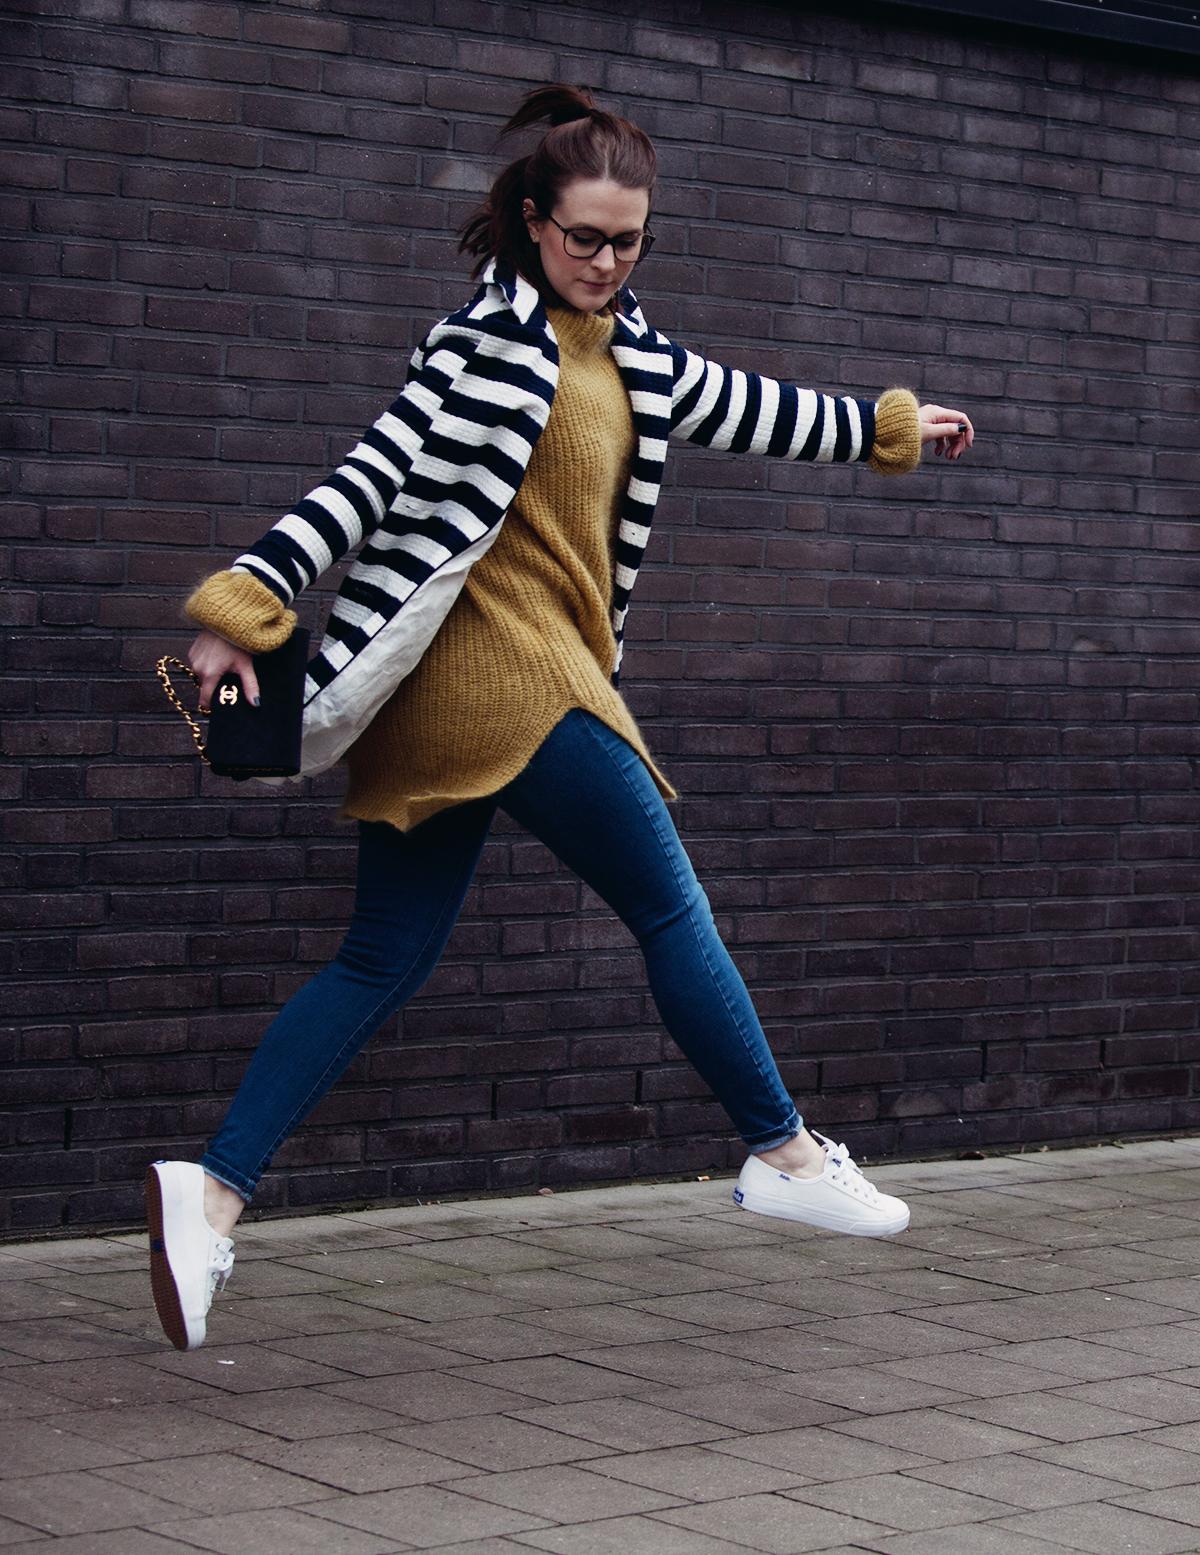 anna frost fafine jump stripes 1